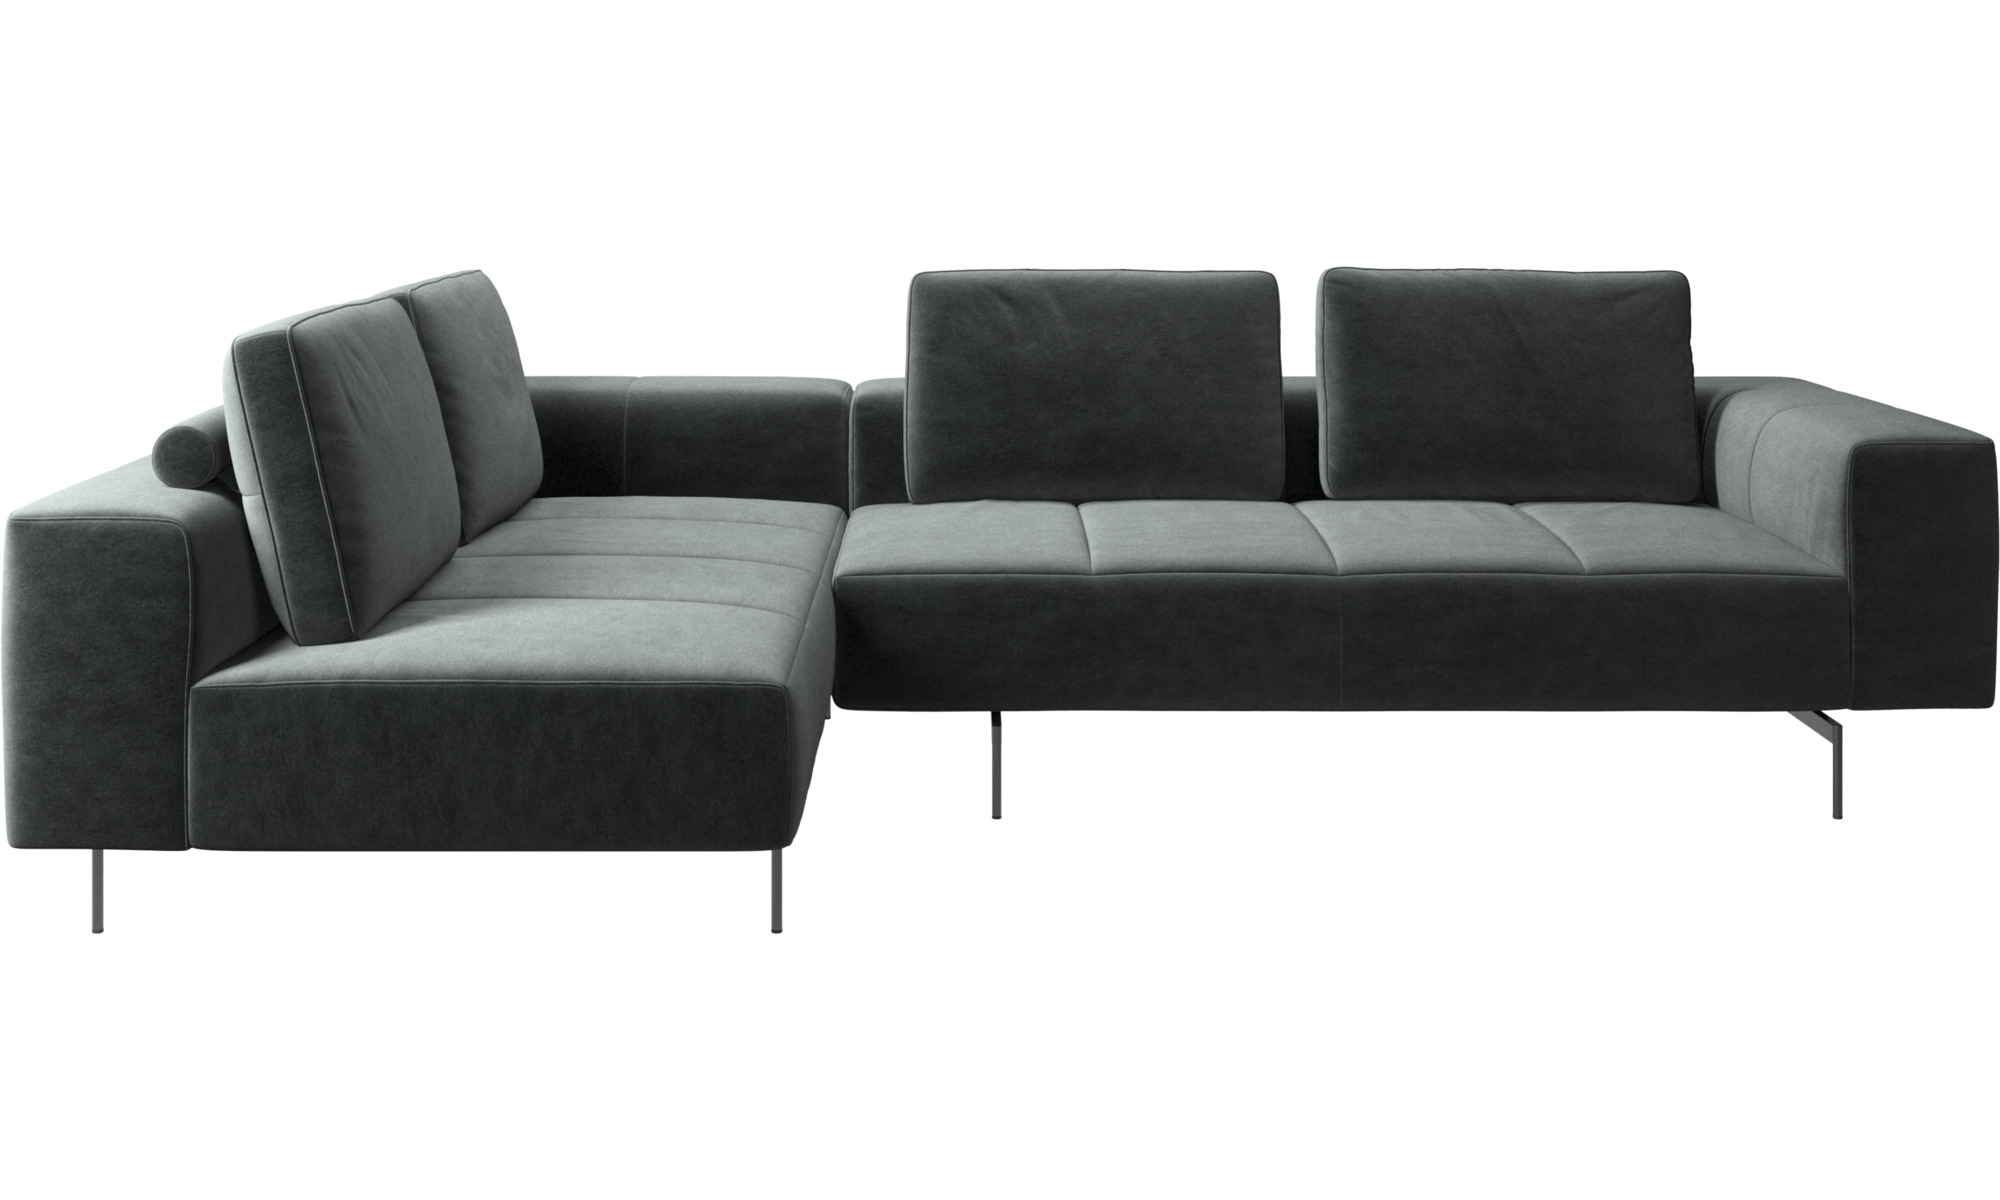 Modular sofas - Amsterdam corner sofa with lounging unit - Green - Fabric